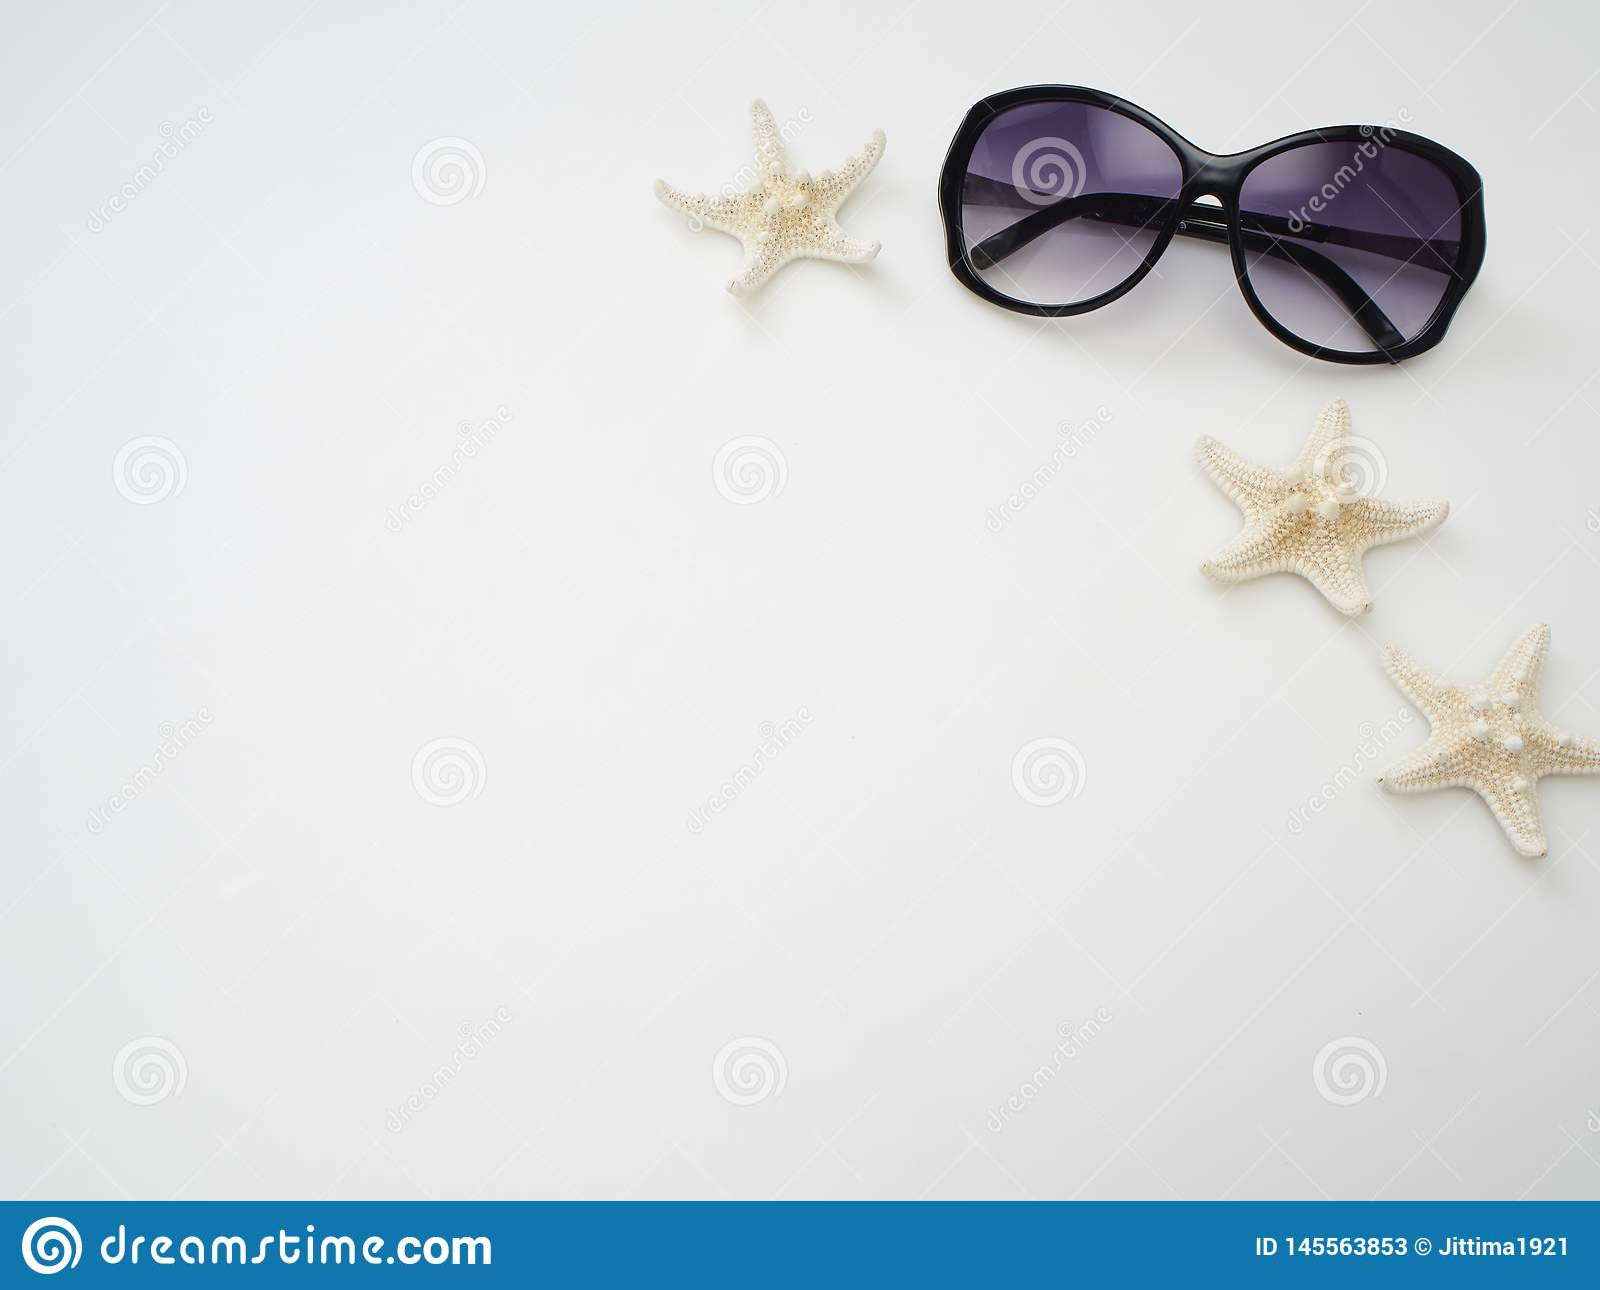 Bakgrund f?r sommarferie, strandtillbeh?r